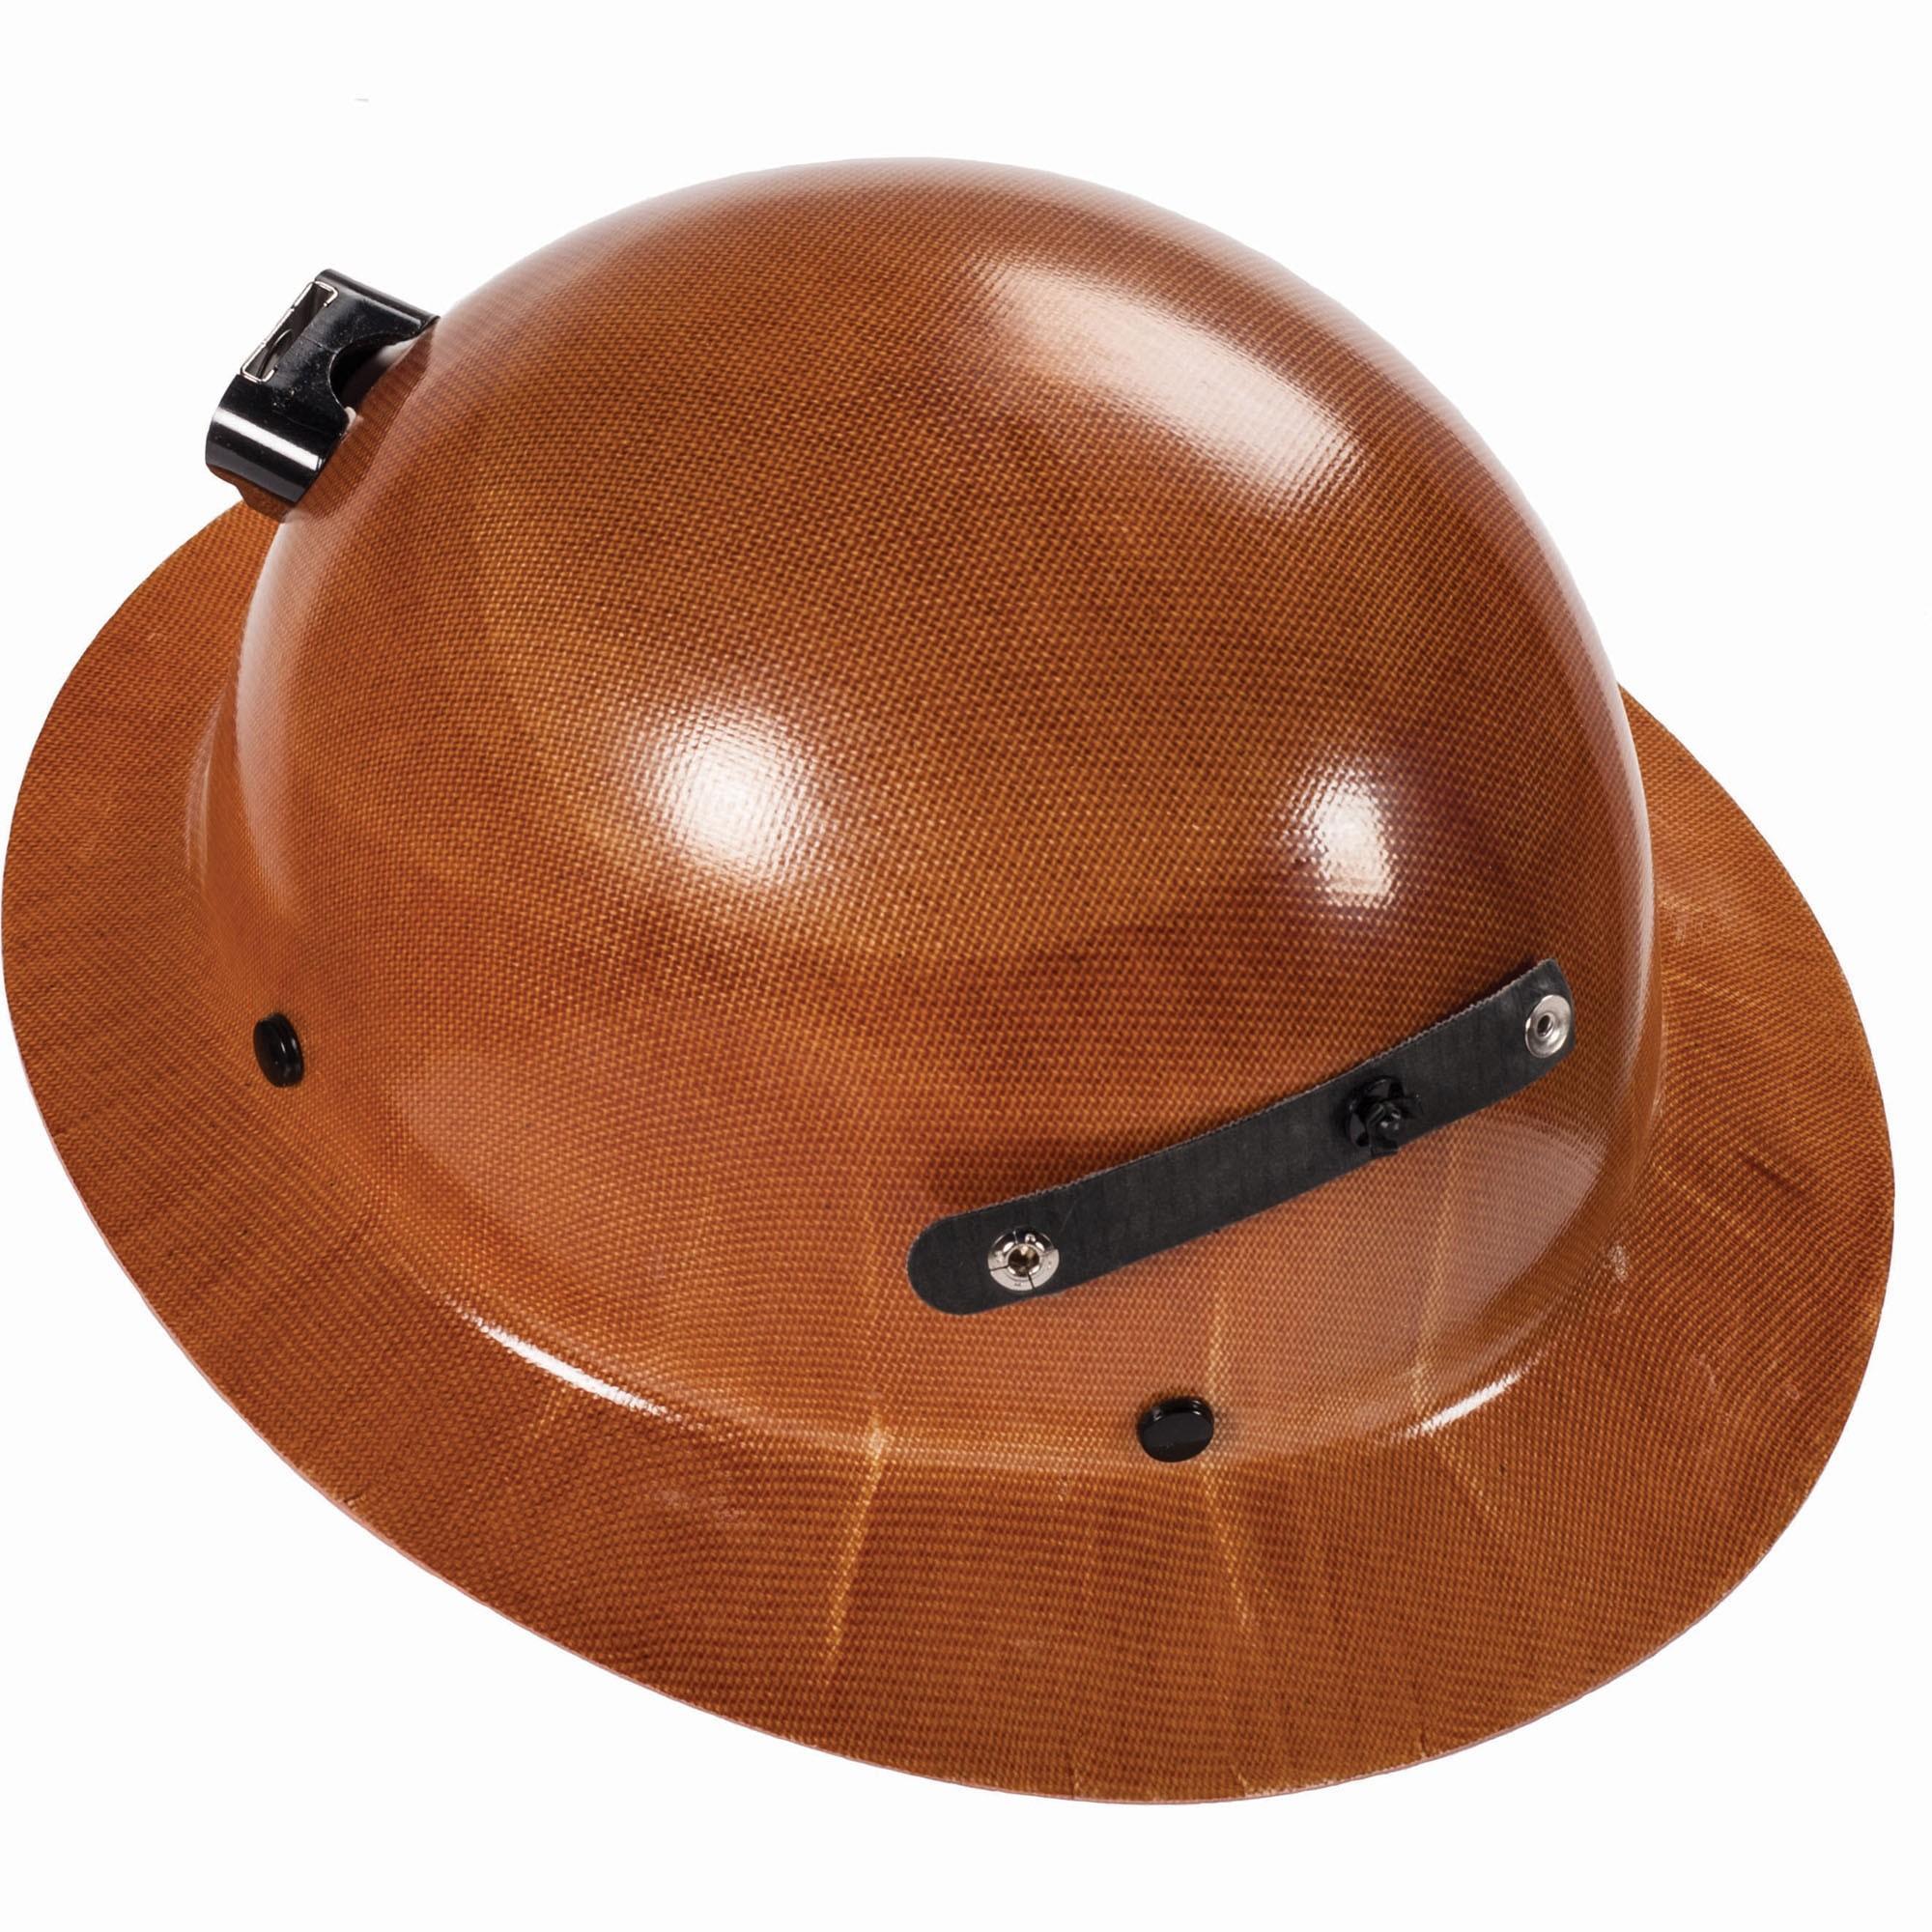 Msa 460389 Skullgard Full Brim Hard Hat W Lamp Bracket